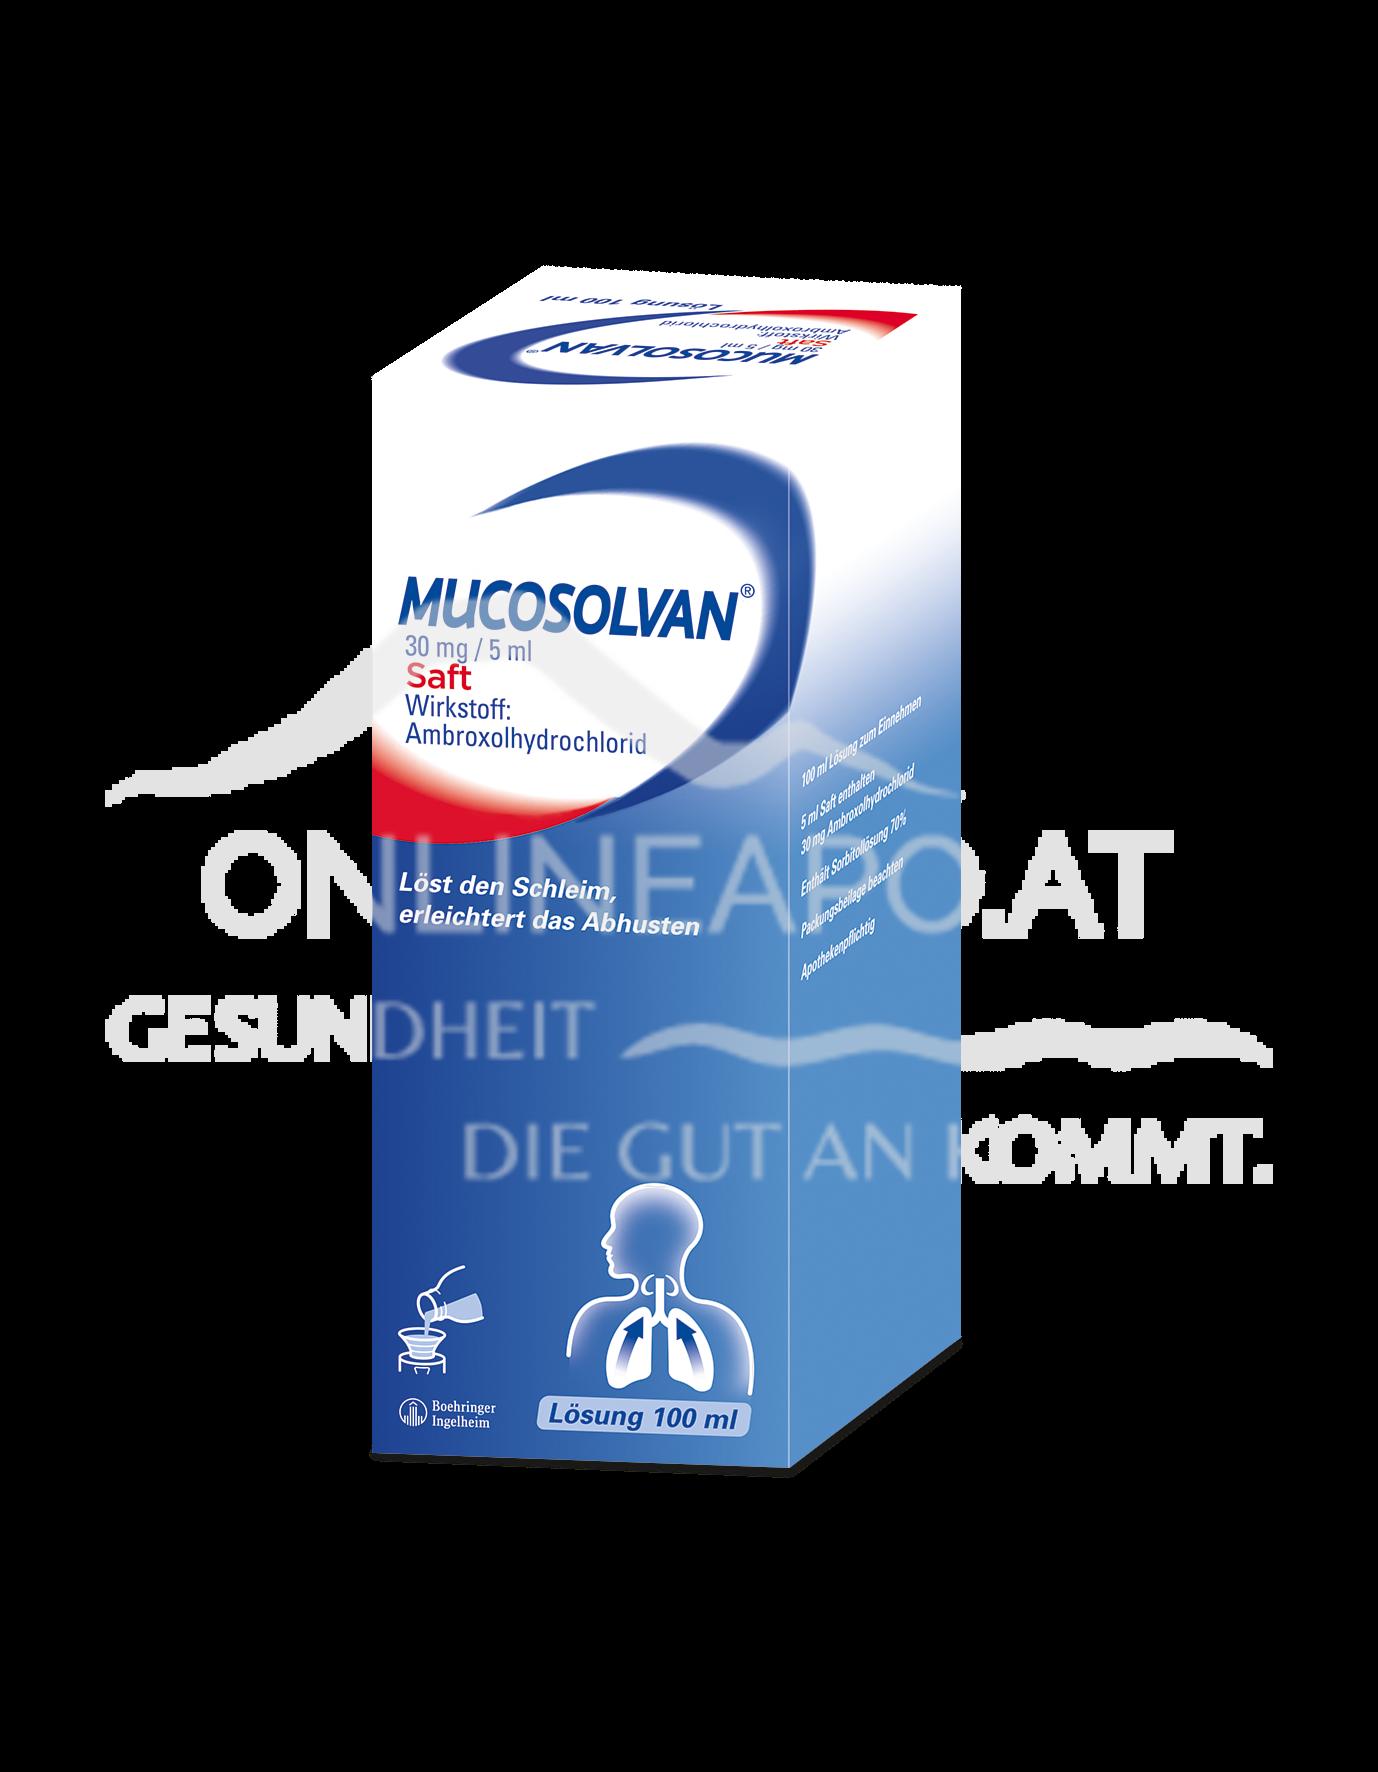 Mucosolvan®30mg/5ml- Saft